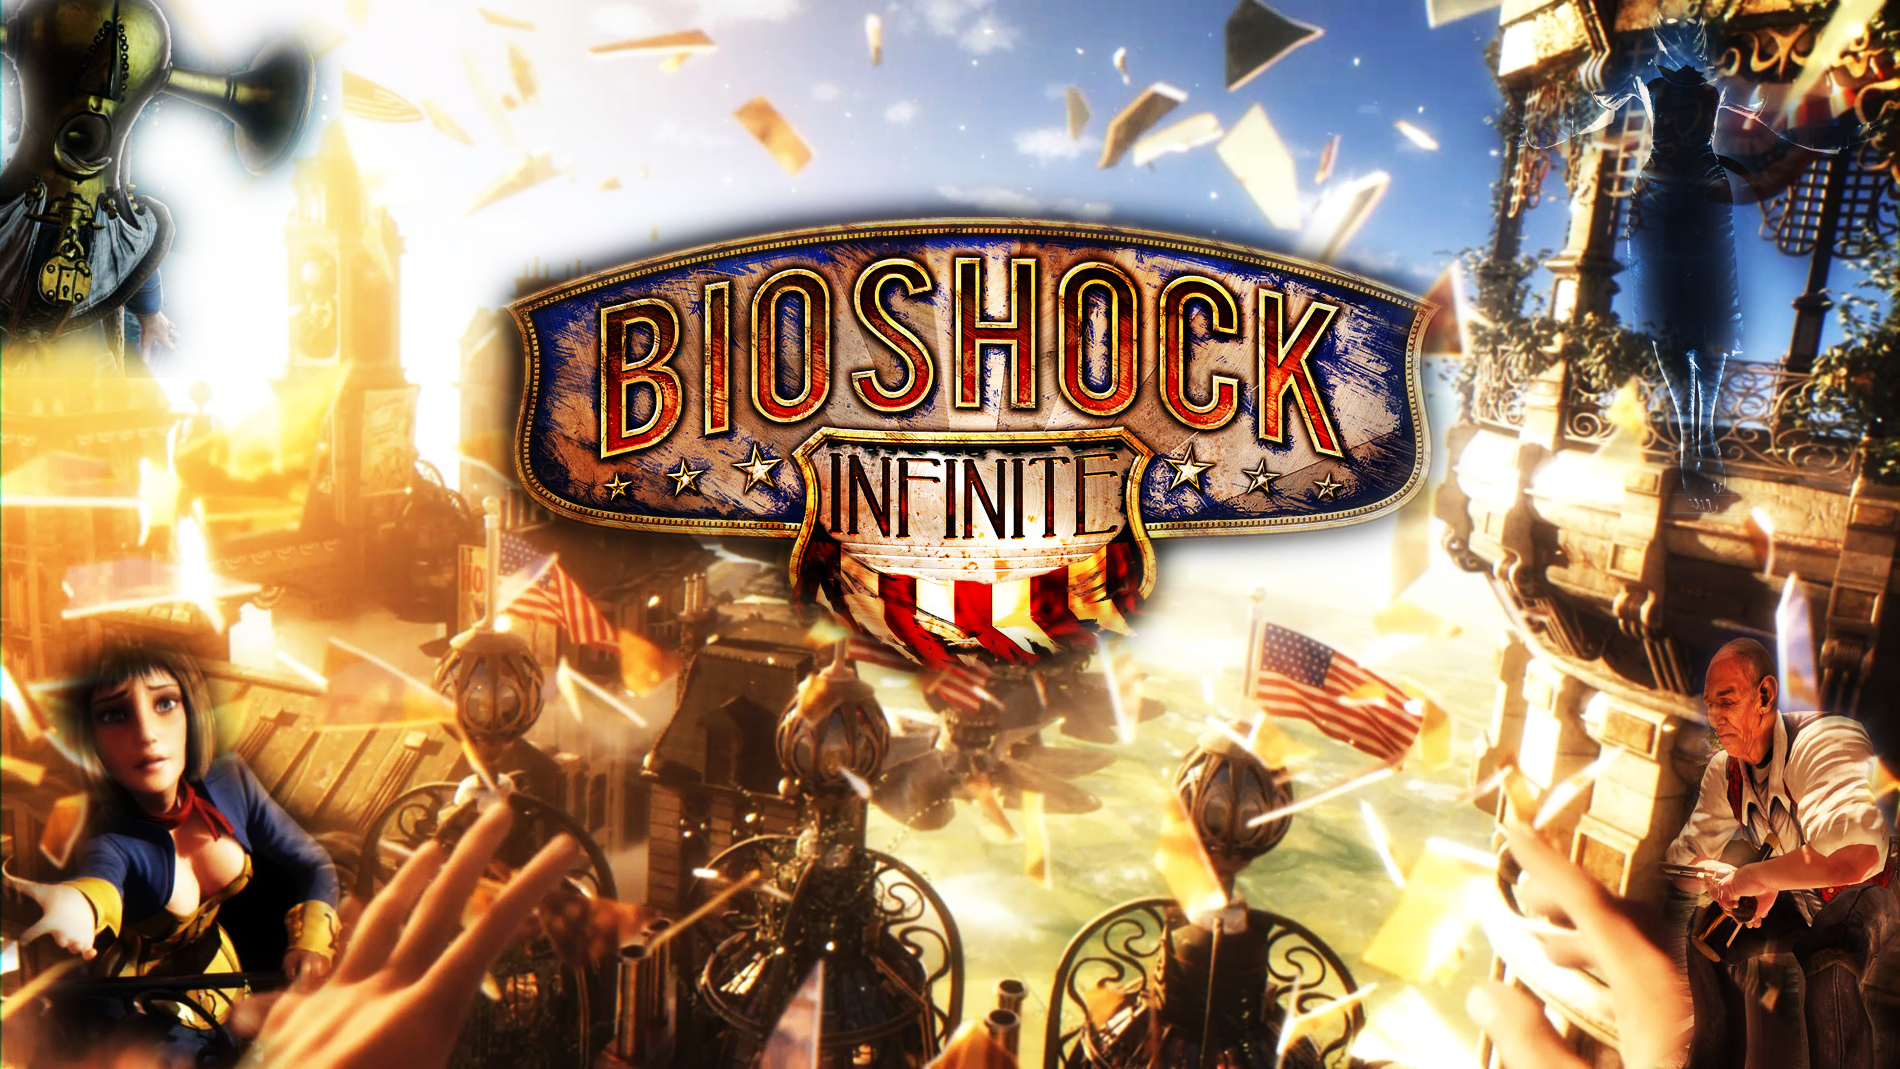 Bioshock Infinite Bioshock Infinite Bioshock Infinite Logo